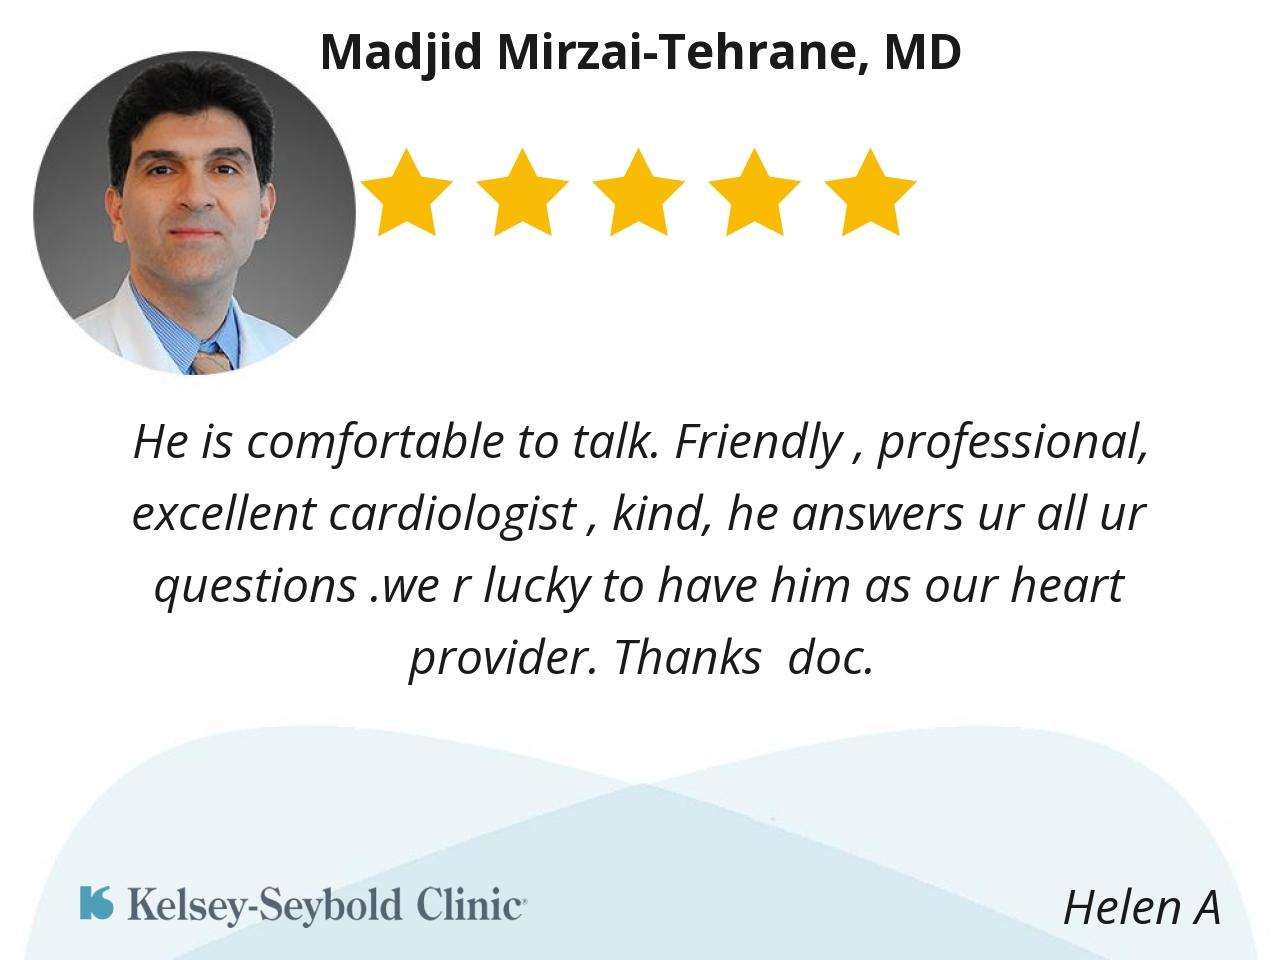 Madjid Mirzaitehrane, MD | Houston Cardiologist | Kelsey-Seybold